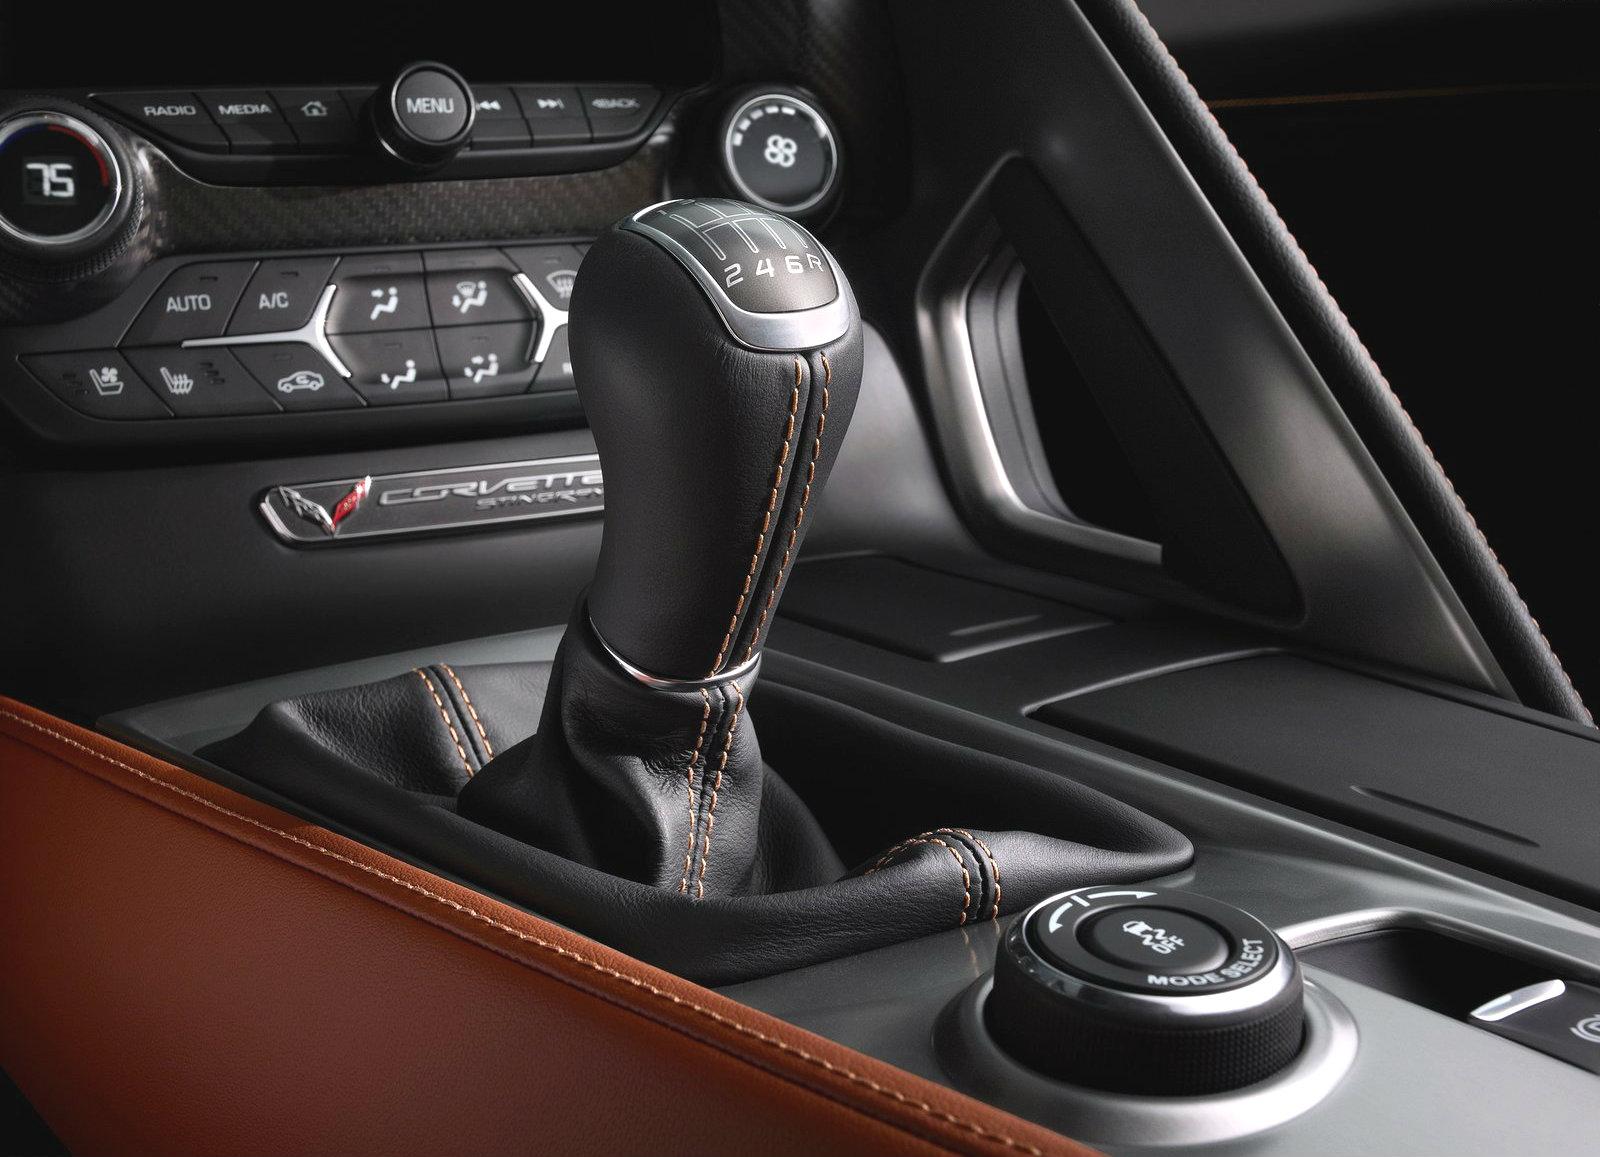 C7 Corvette Customers Love to Shift Gears Manually - autoevolution